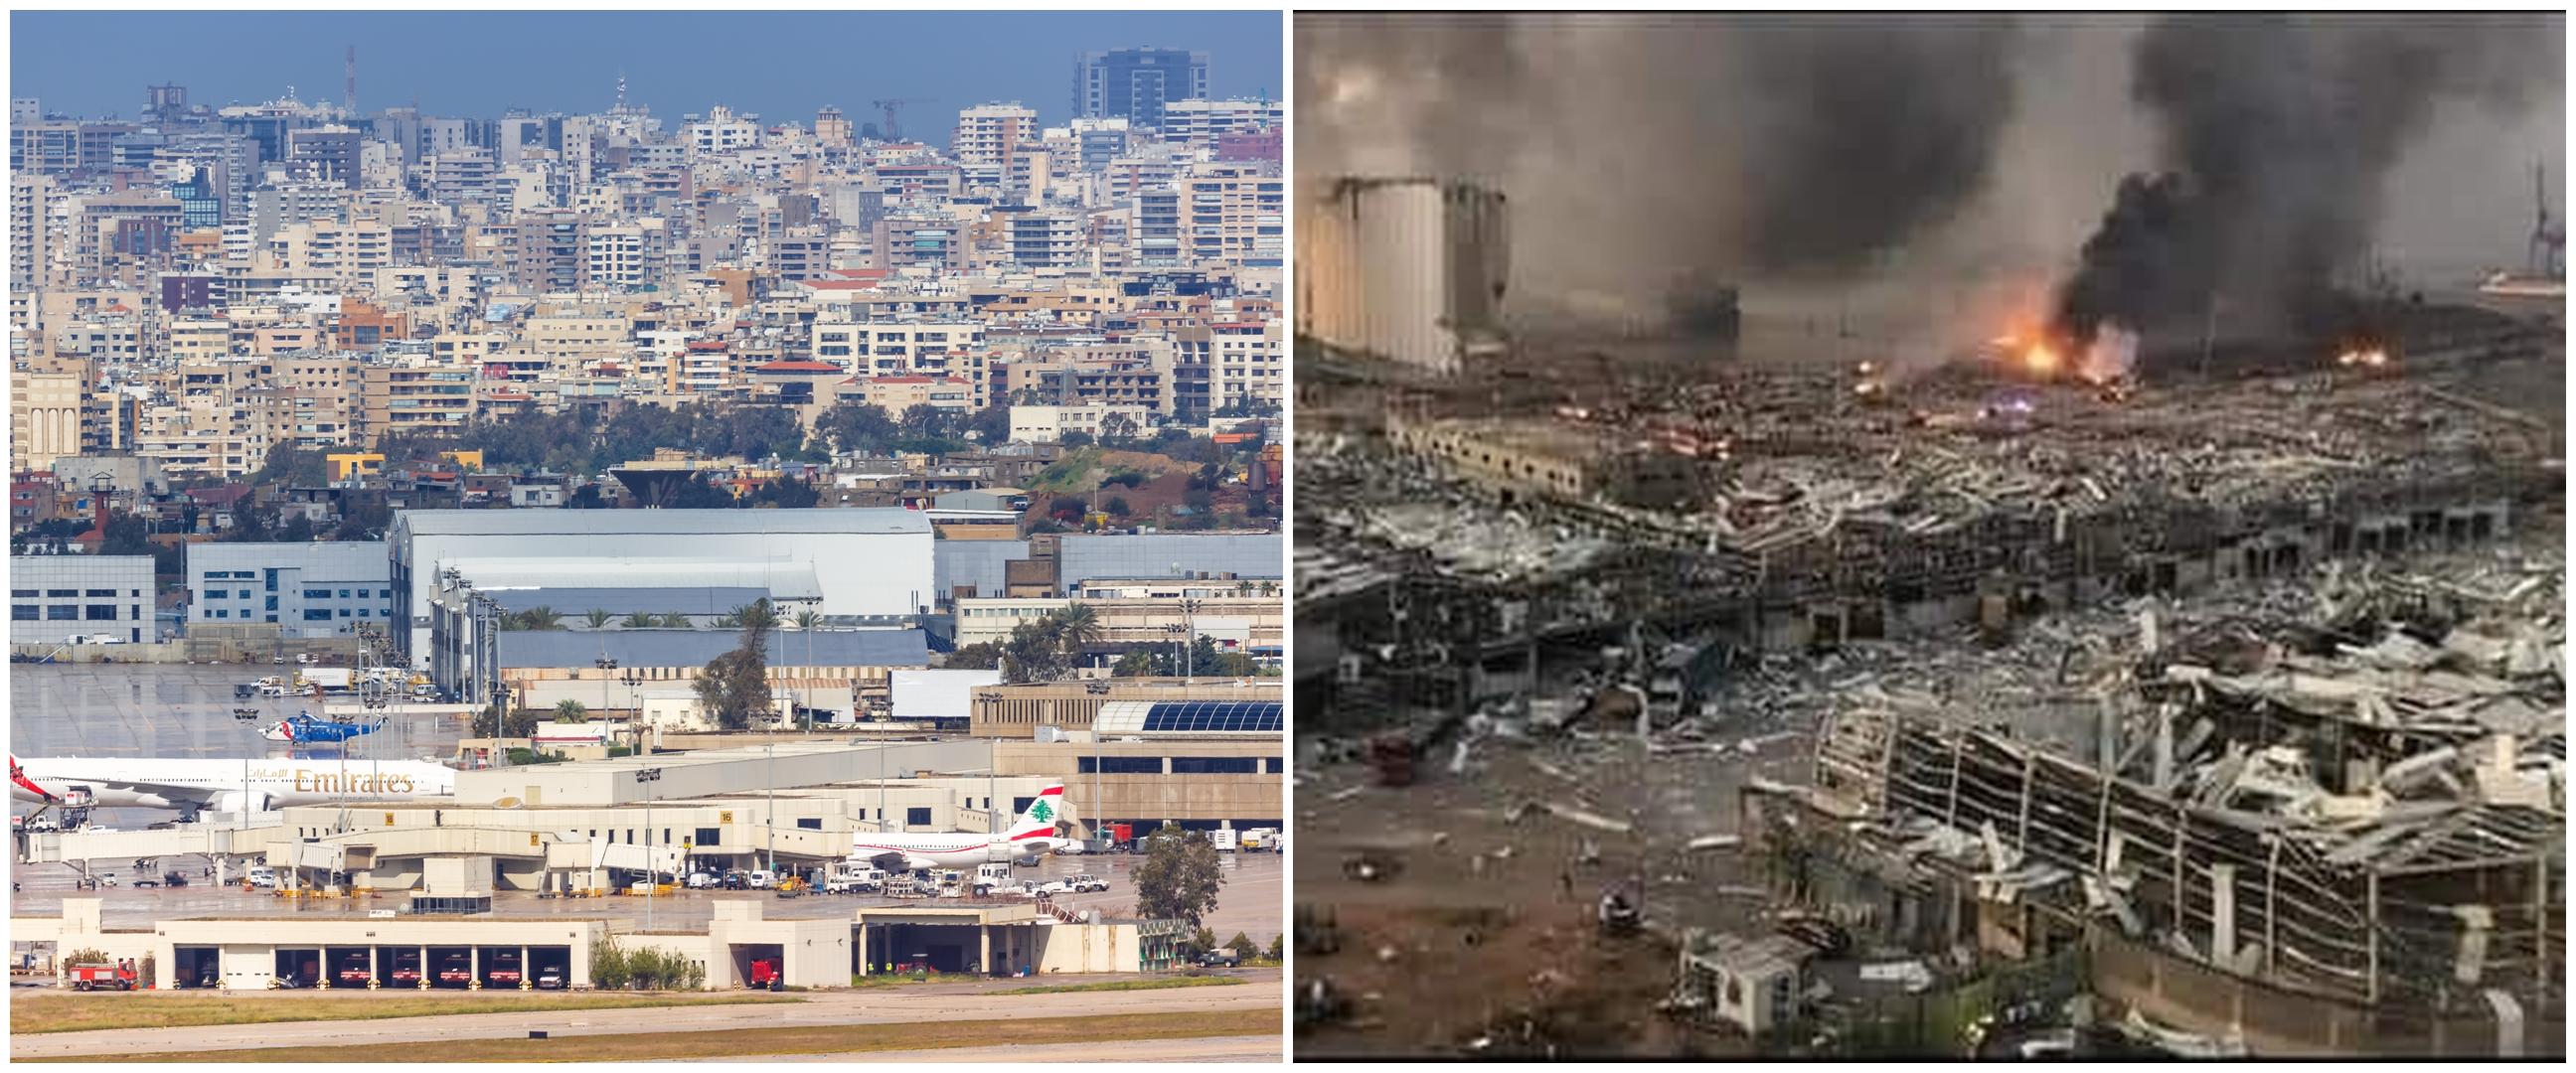 7 Potret keindahan Beirut sebelum ledakan dahsyat